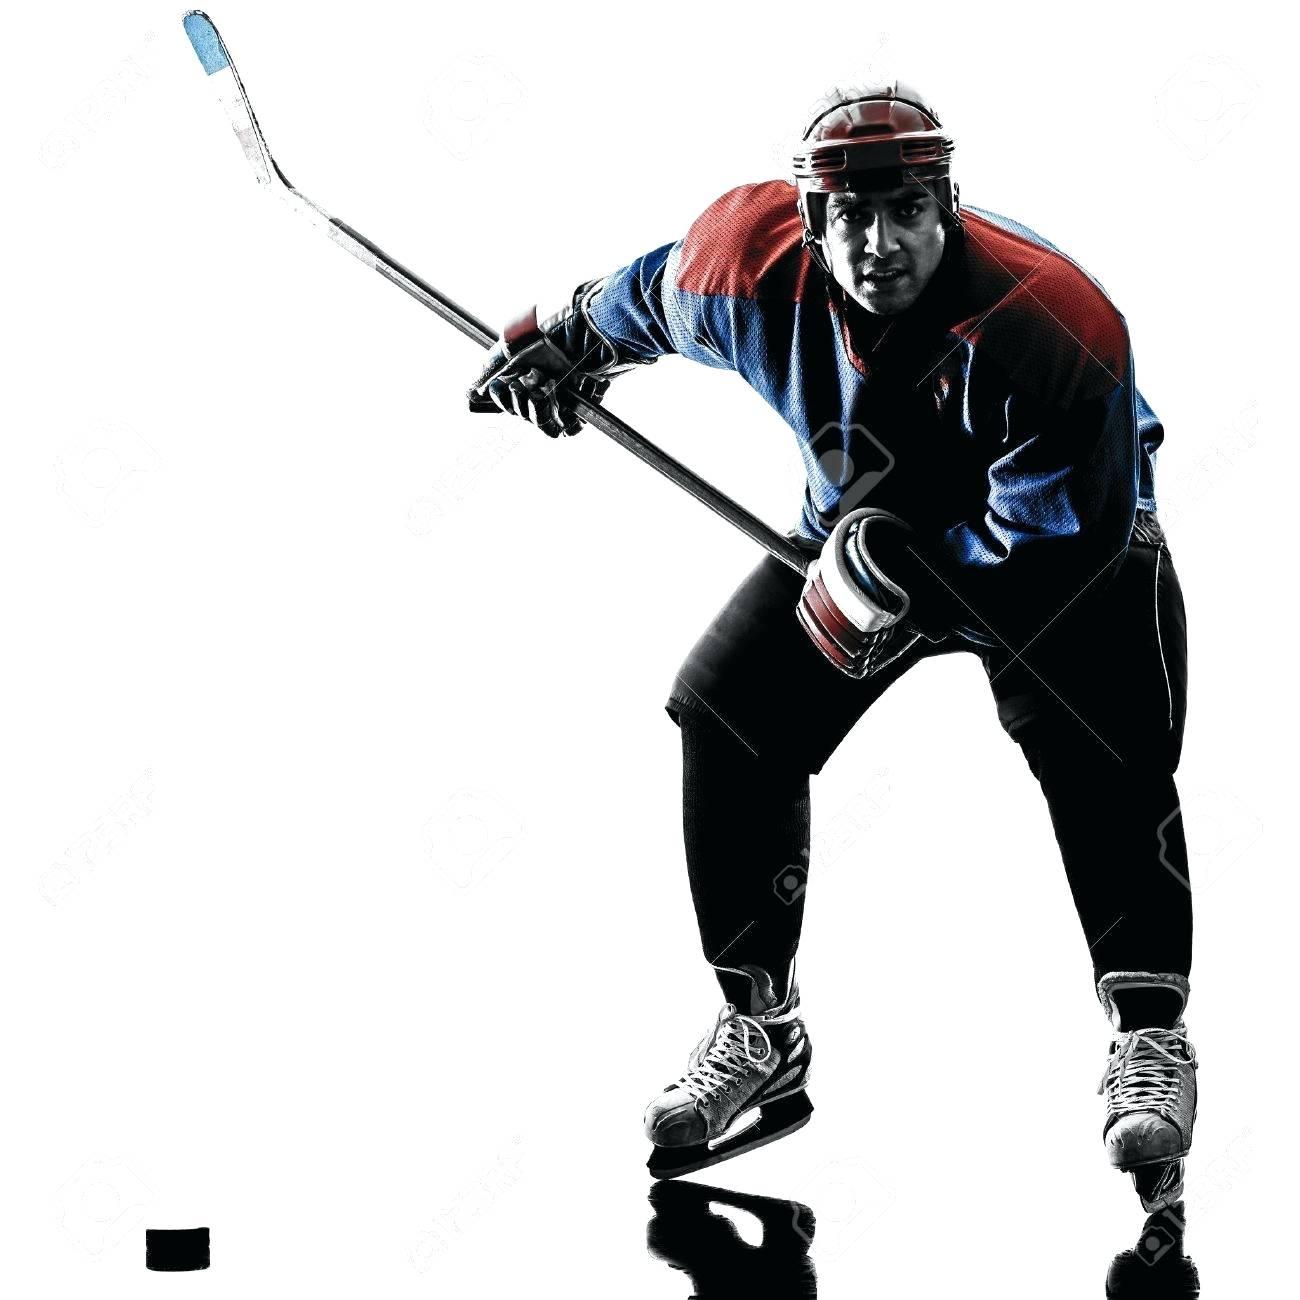 1300x1300 Hockey Gear And Equipment Hockey Player Template One Man Ice